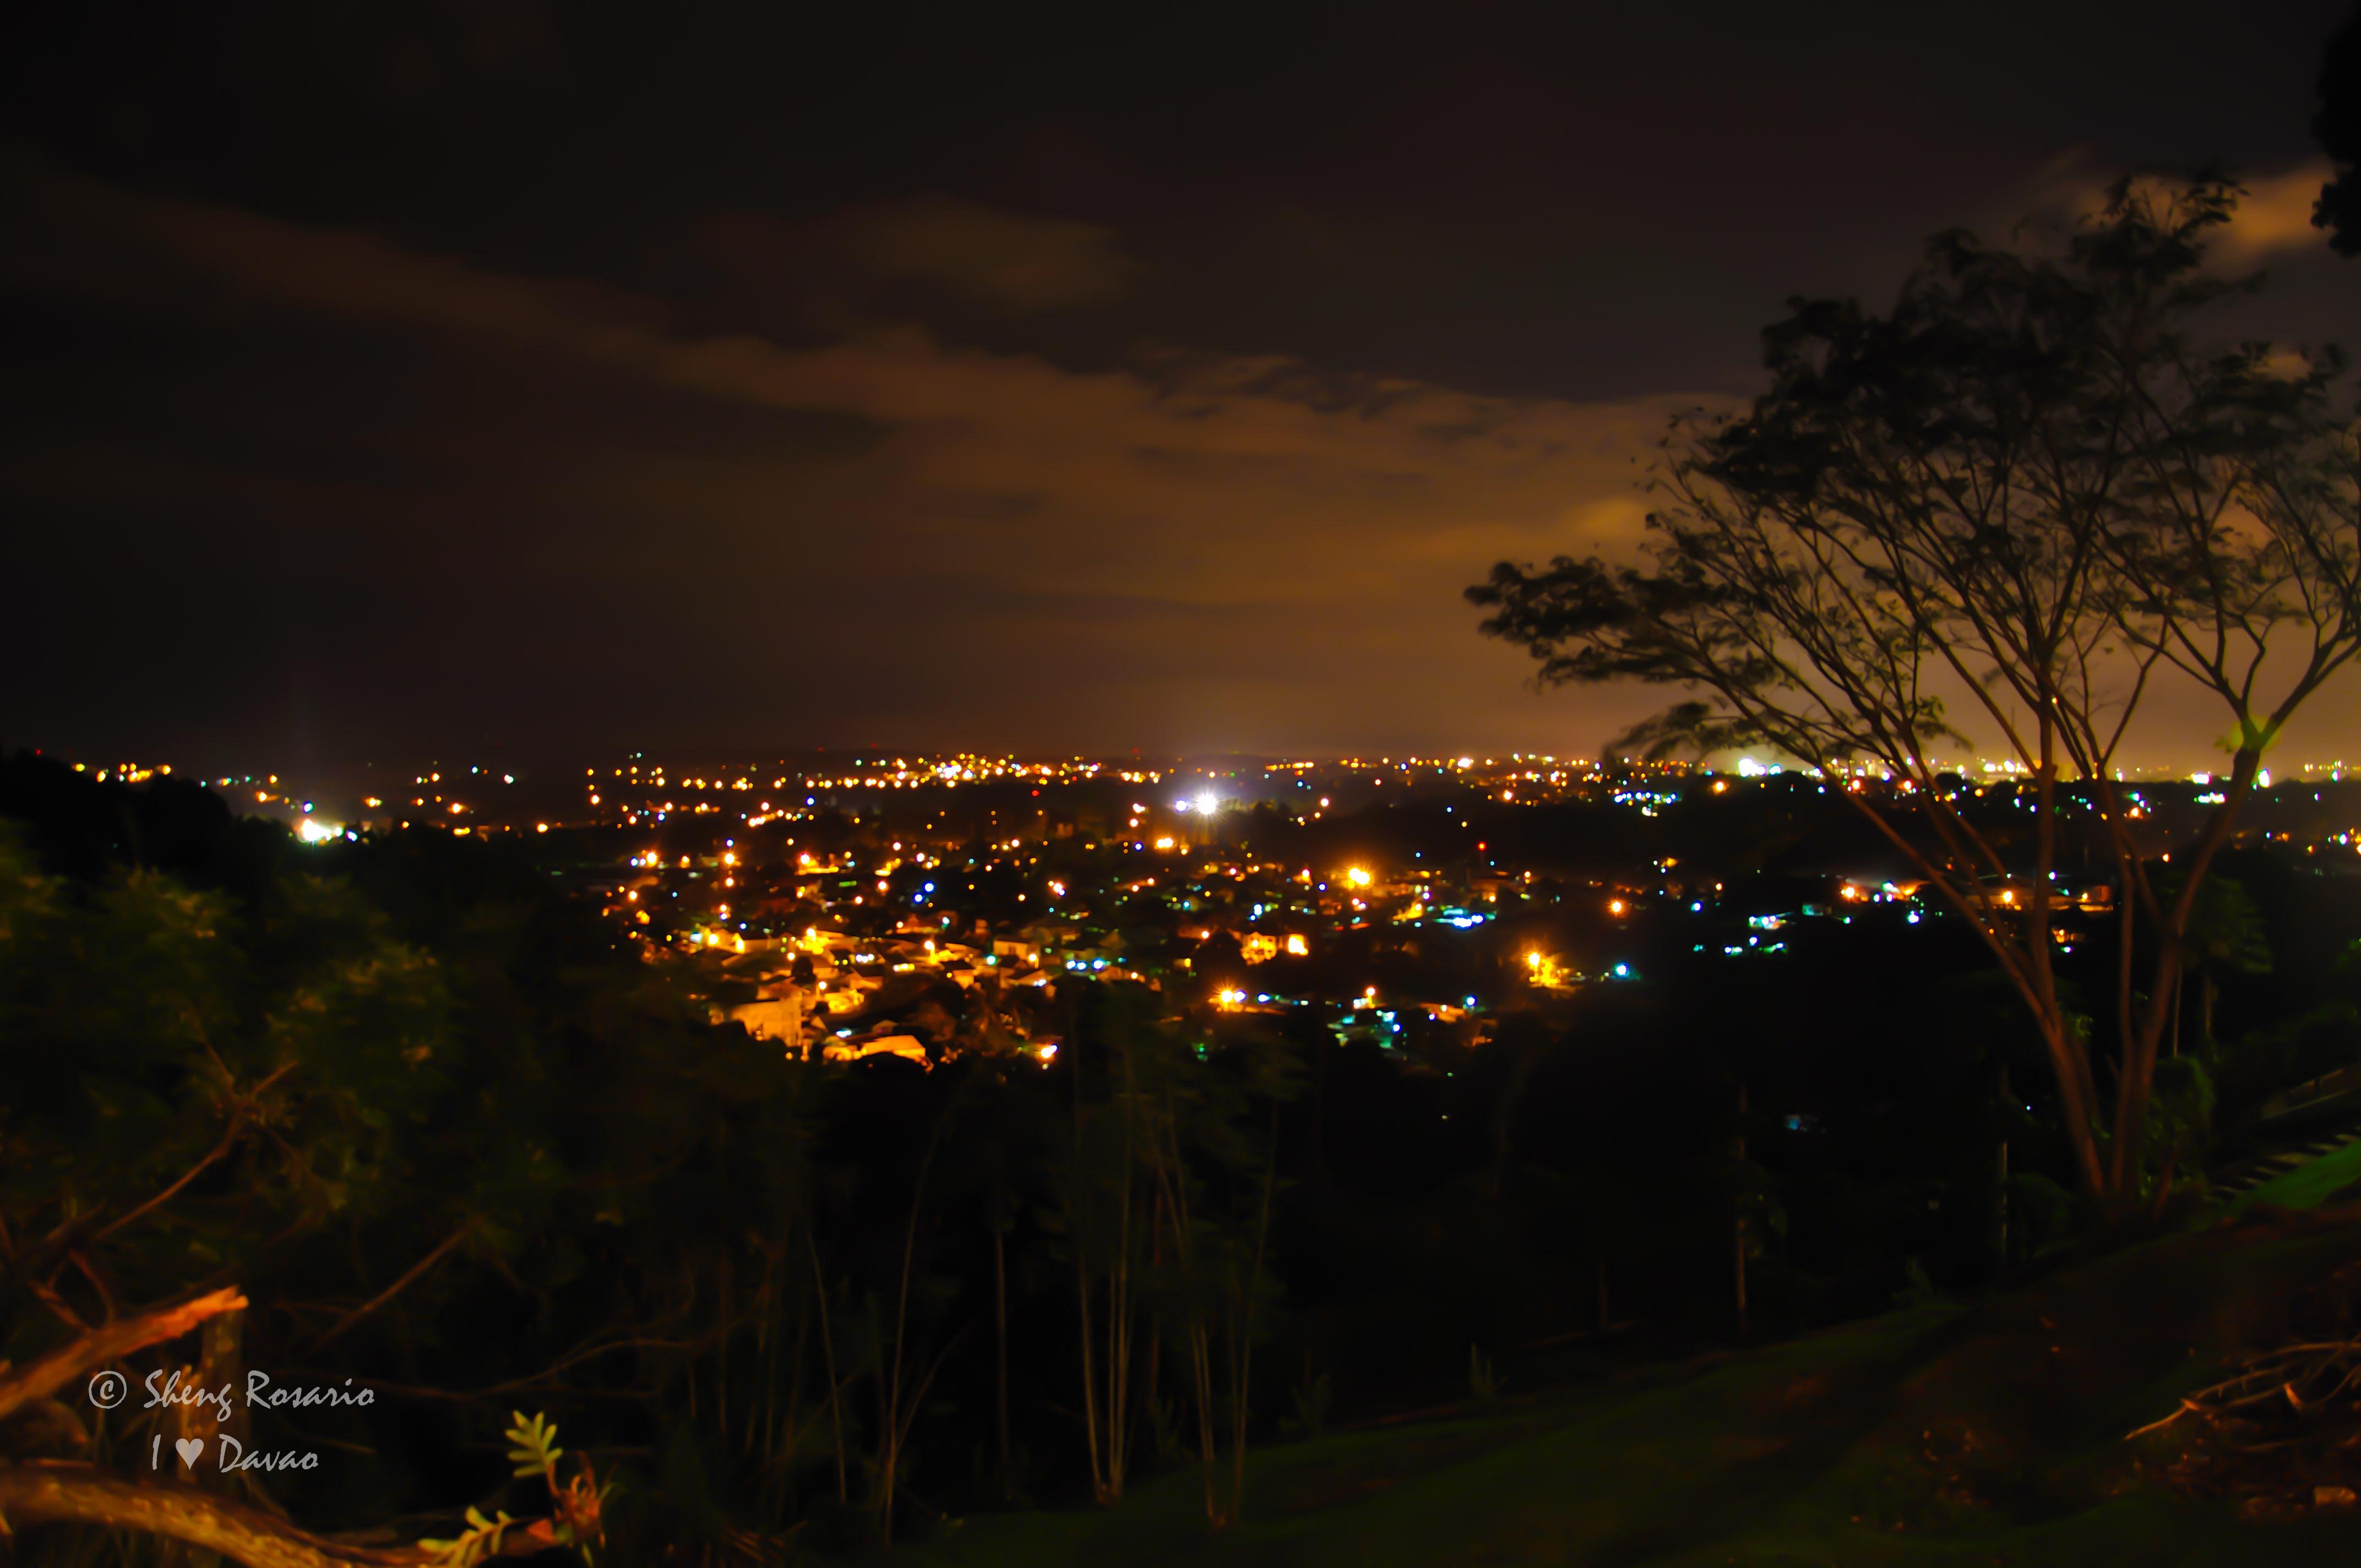 Jack's Ridge, Davao City